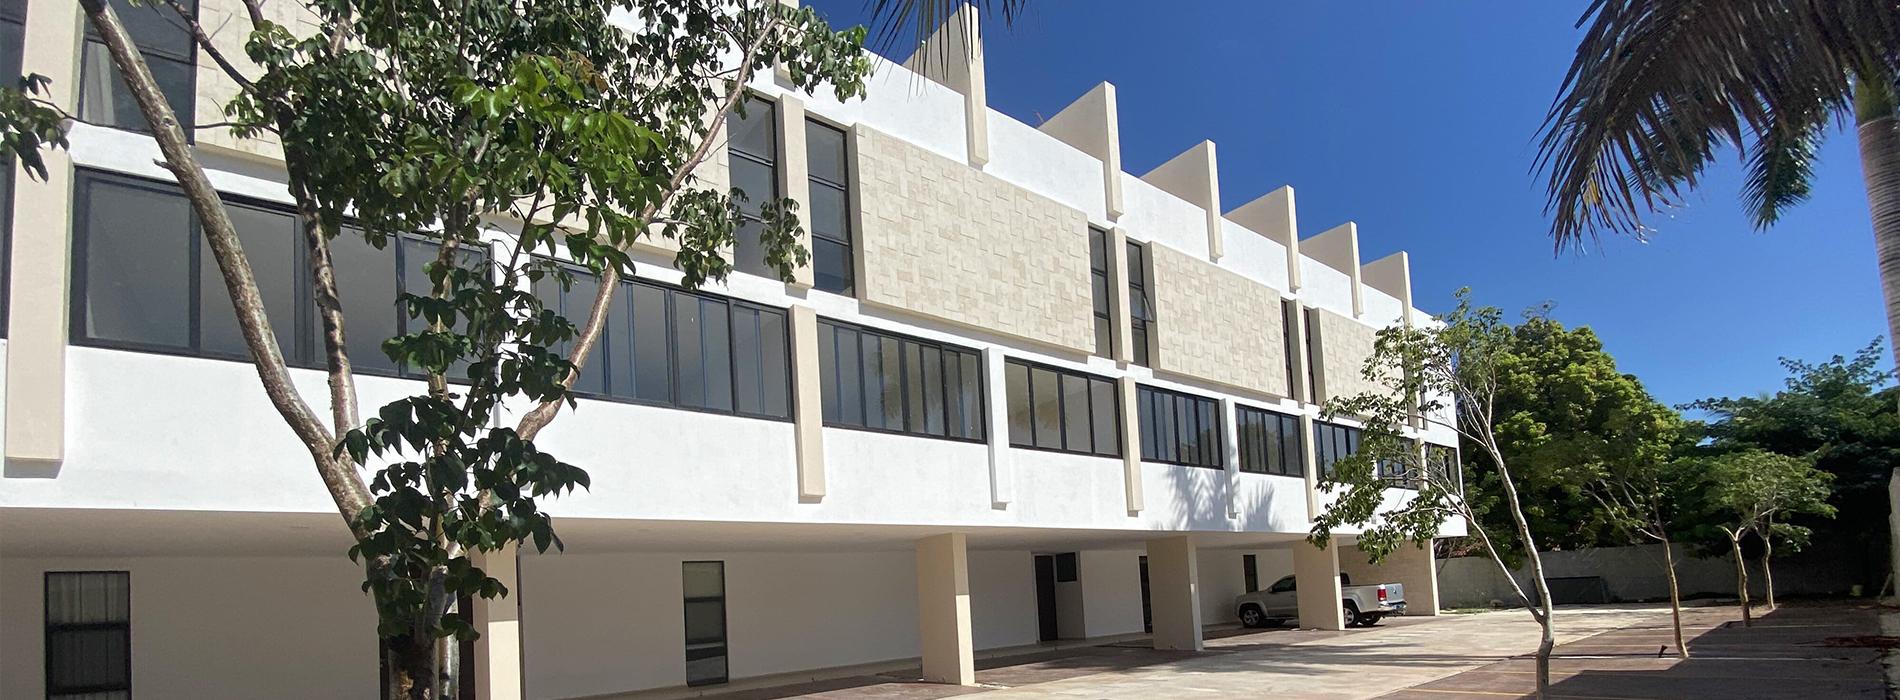 Townhouses Venta Mérida Loften Goodlers